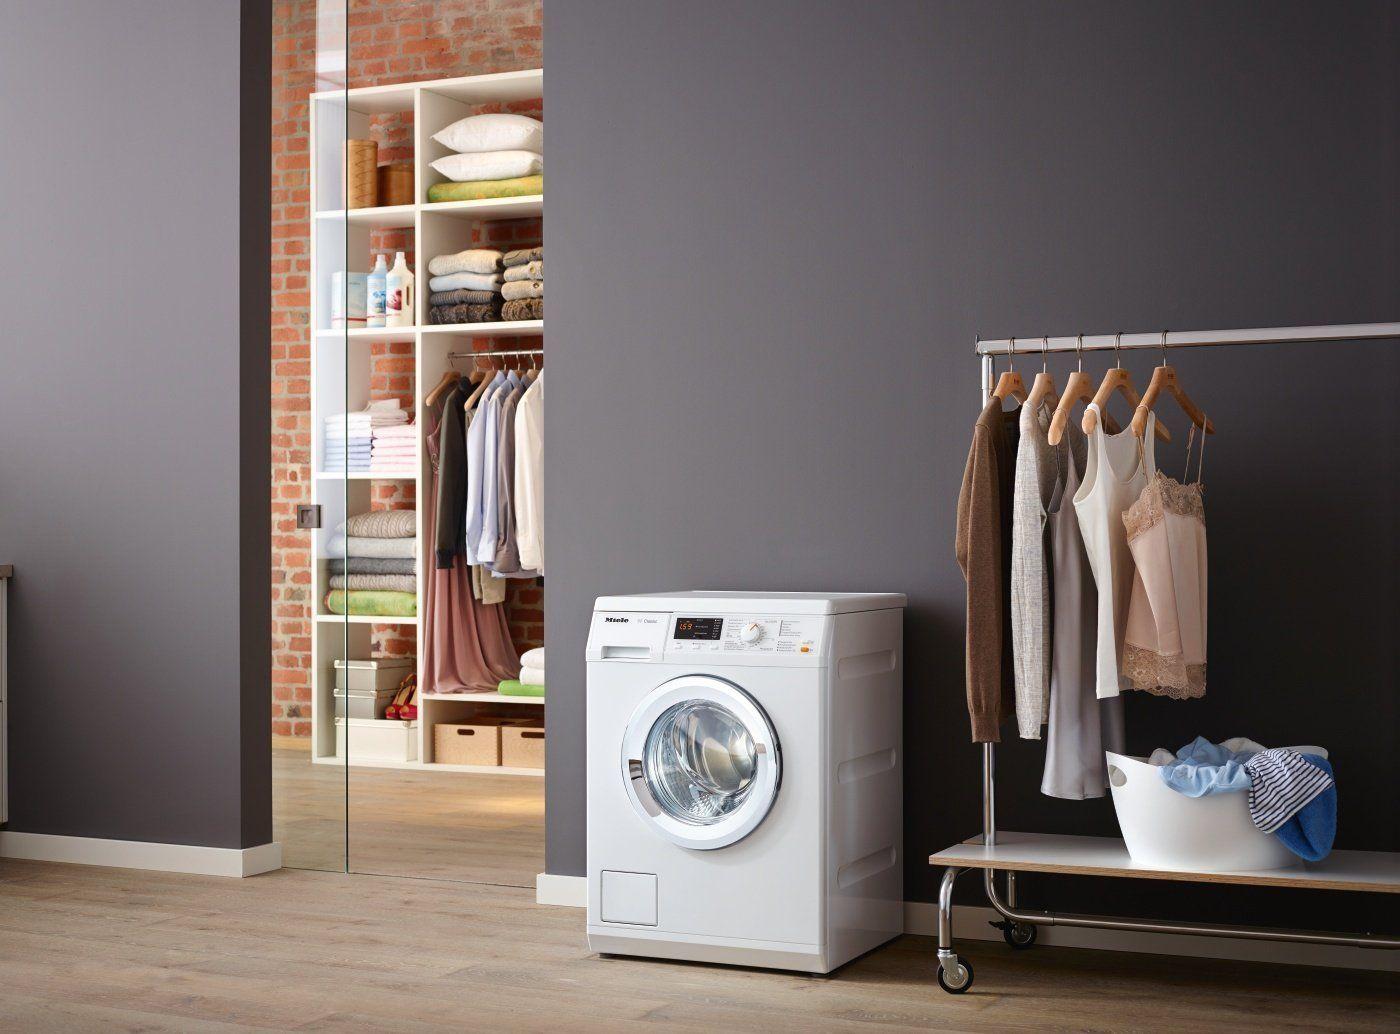 miele waschmaschinen expertentesten. Black Bedroom Furniture Sets. Home Design Ideas